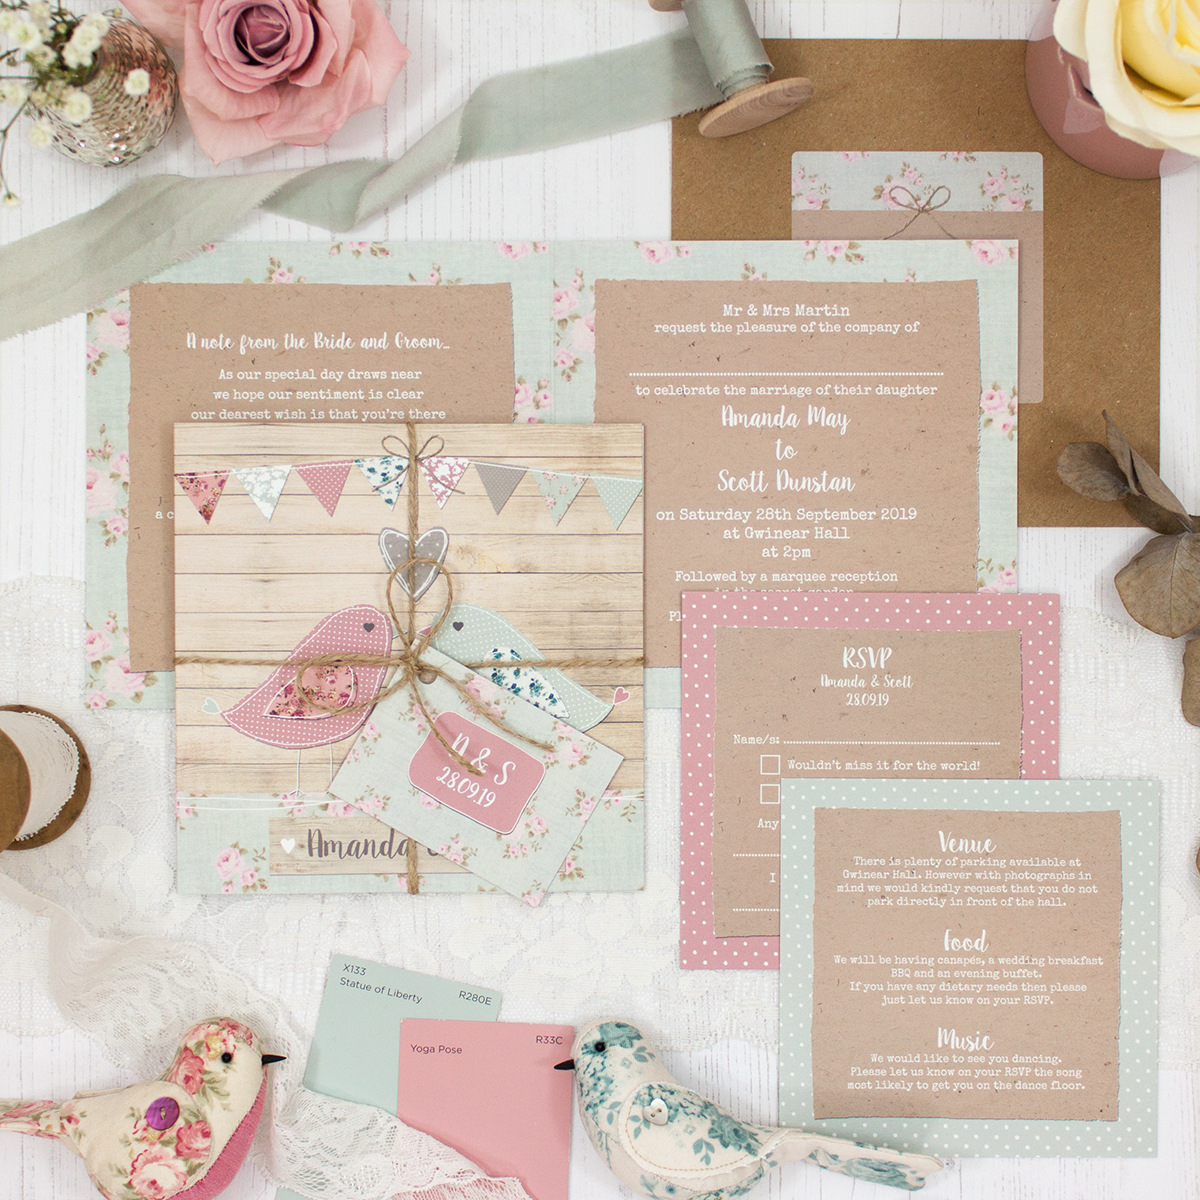 Lovebirds Wedding showing invitation